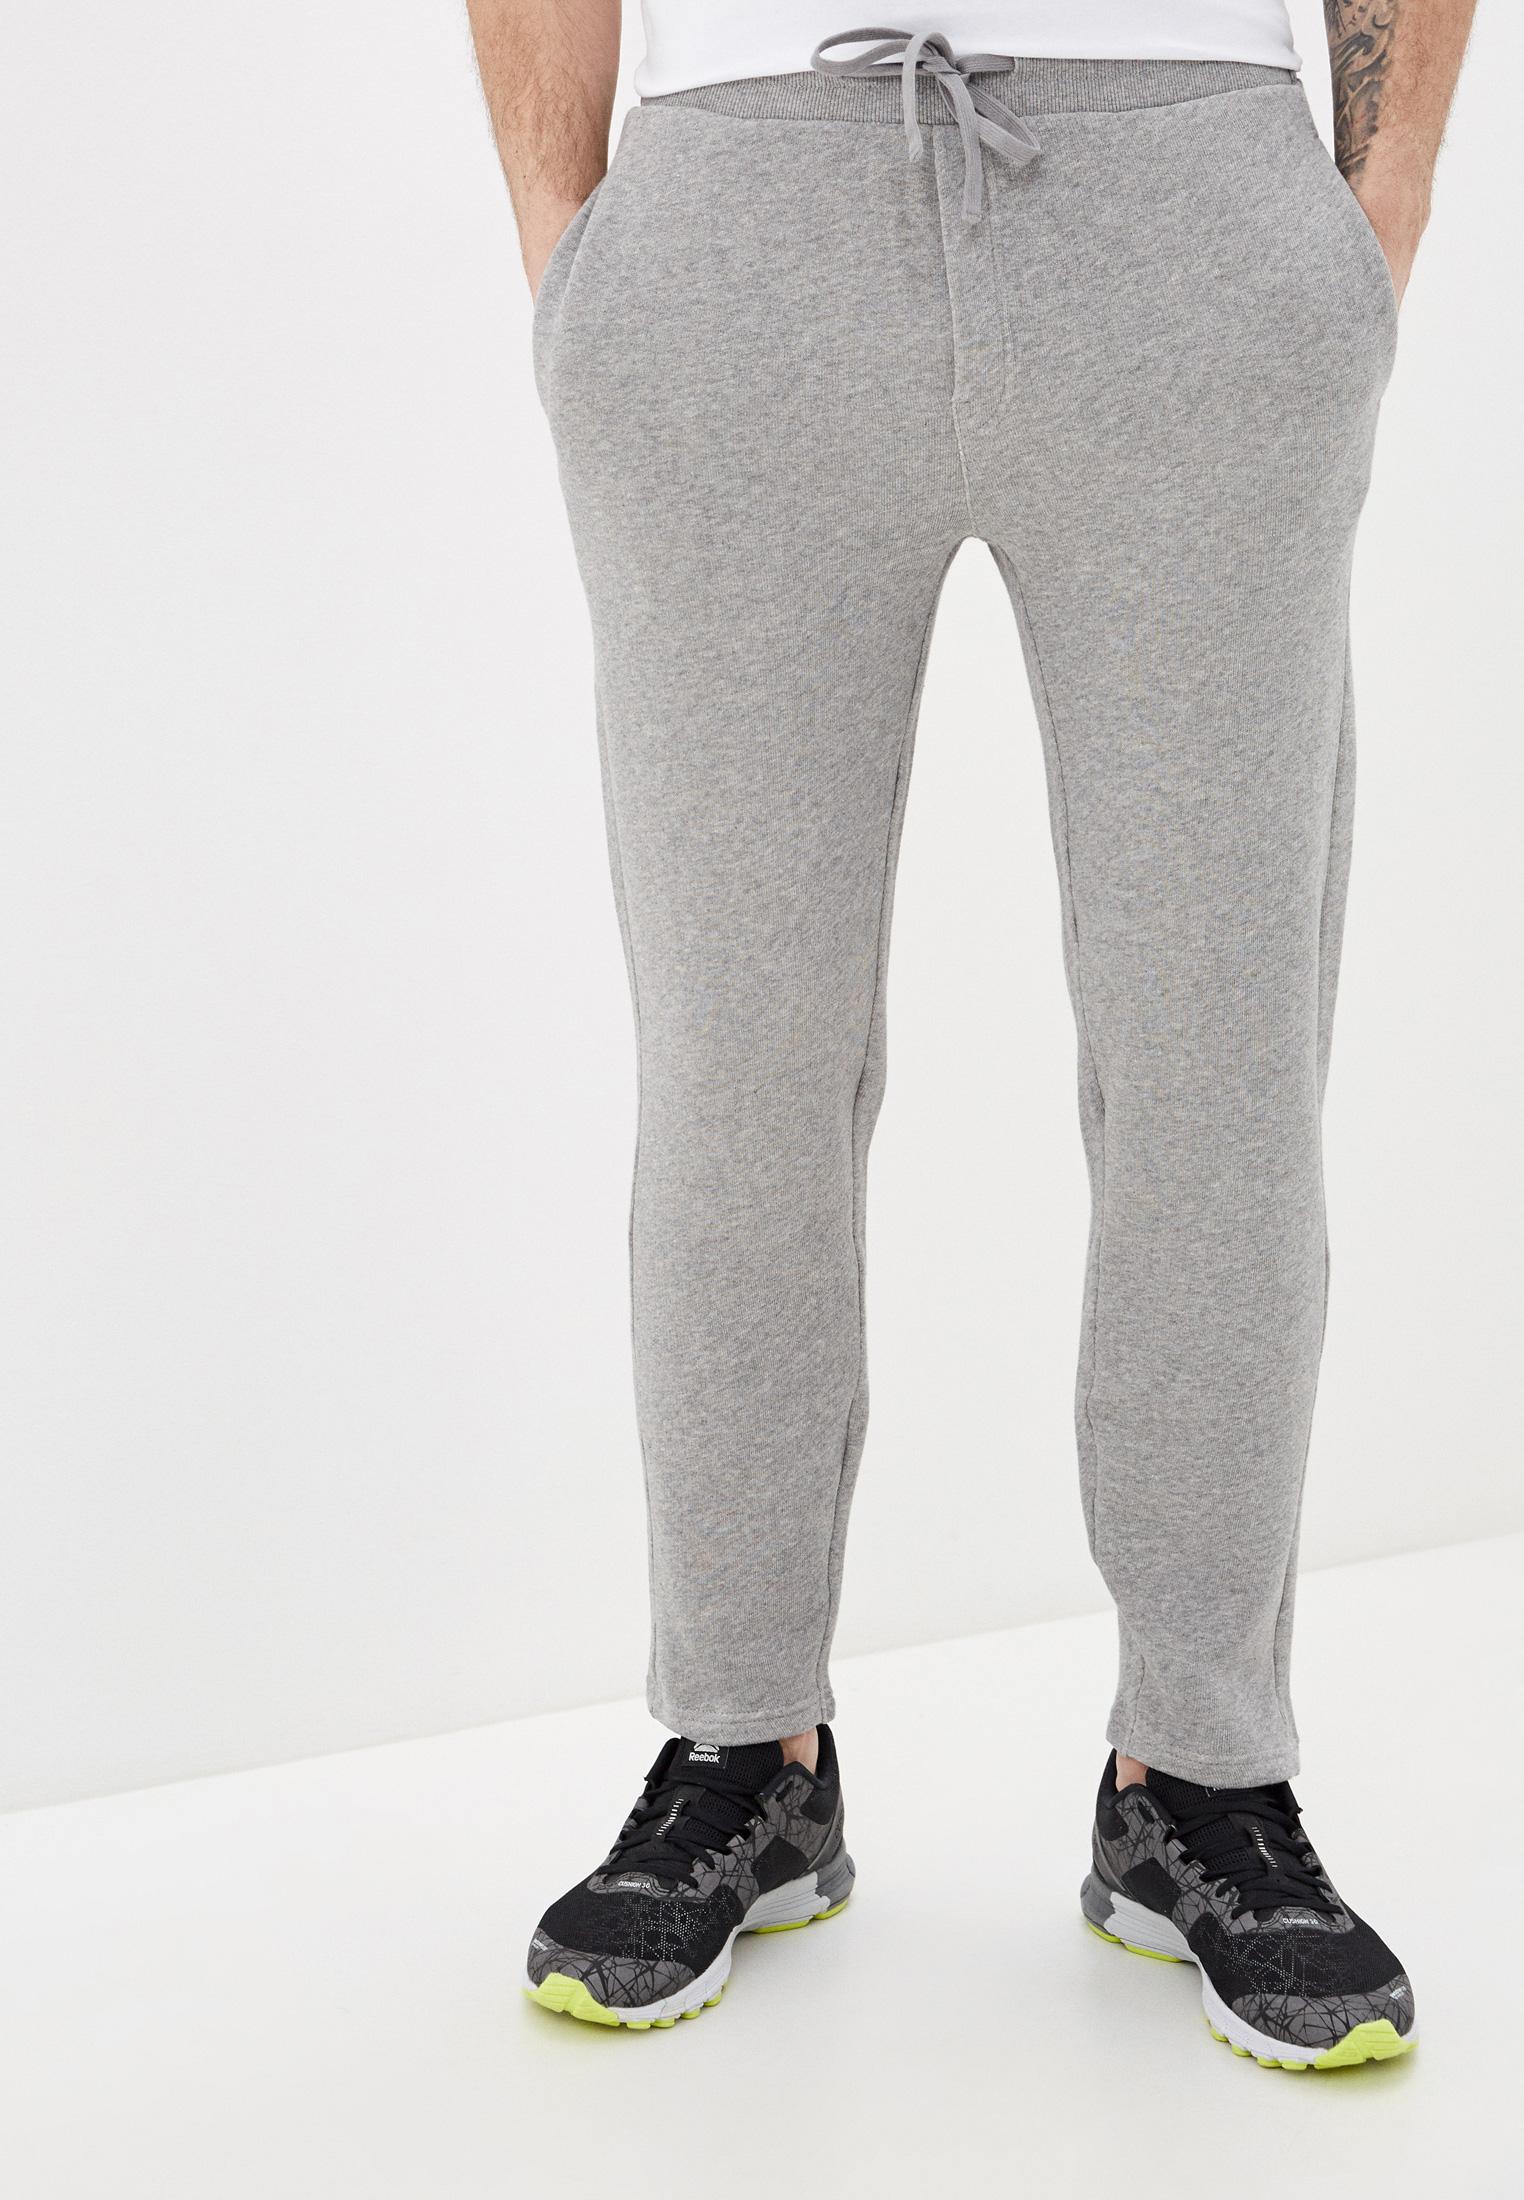 Мужские спортивные брюки United Colors of Benetton (Юнайтед Колорс оф Бенеттон) 3DCGP0490